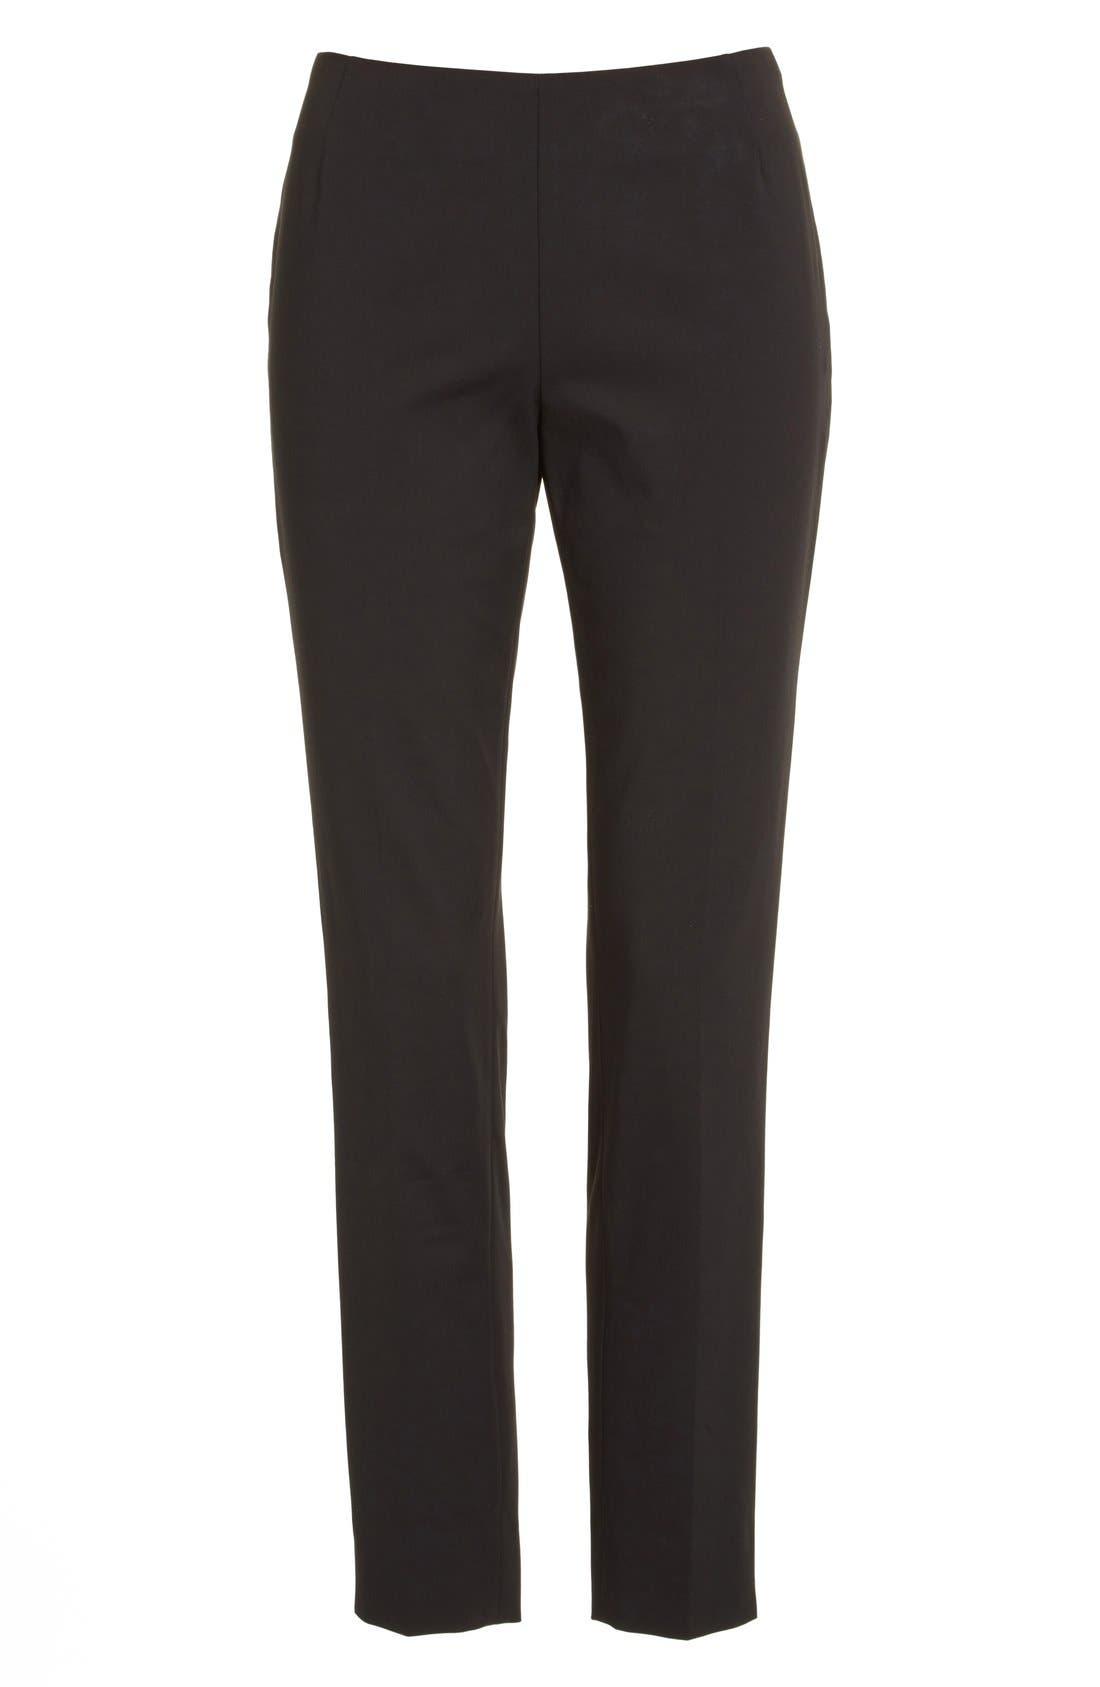 'Stanton' Slim Leg Ankle Pants,                             Alternate thumbnail 8, color,                             BLACK